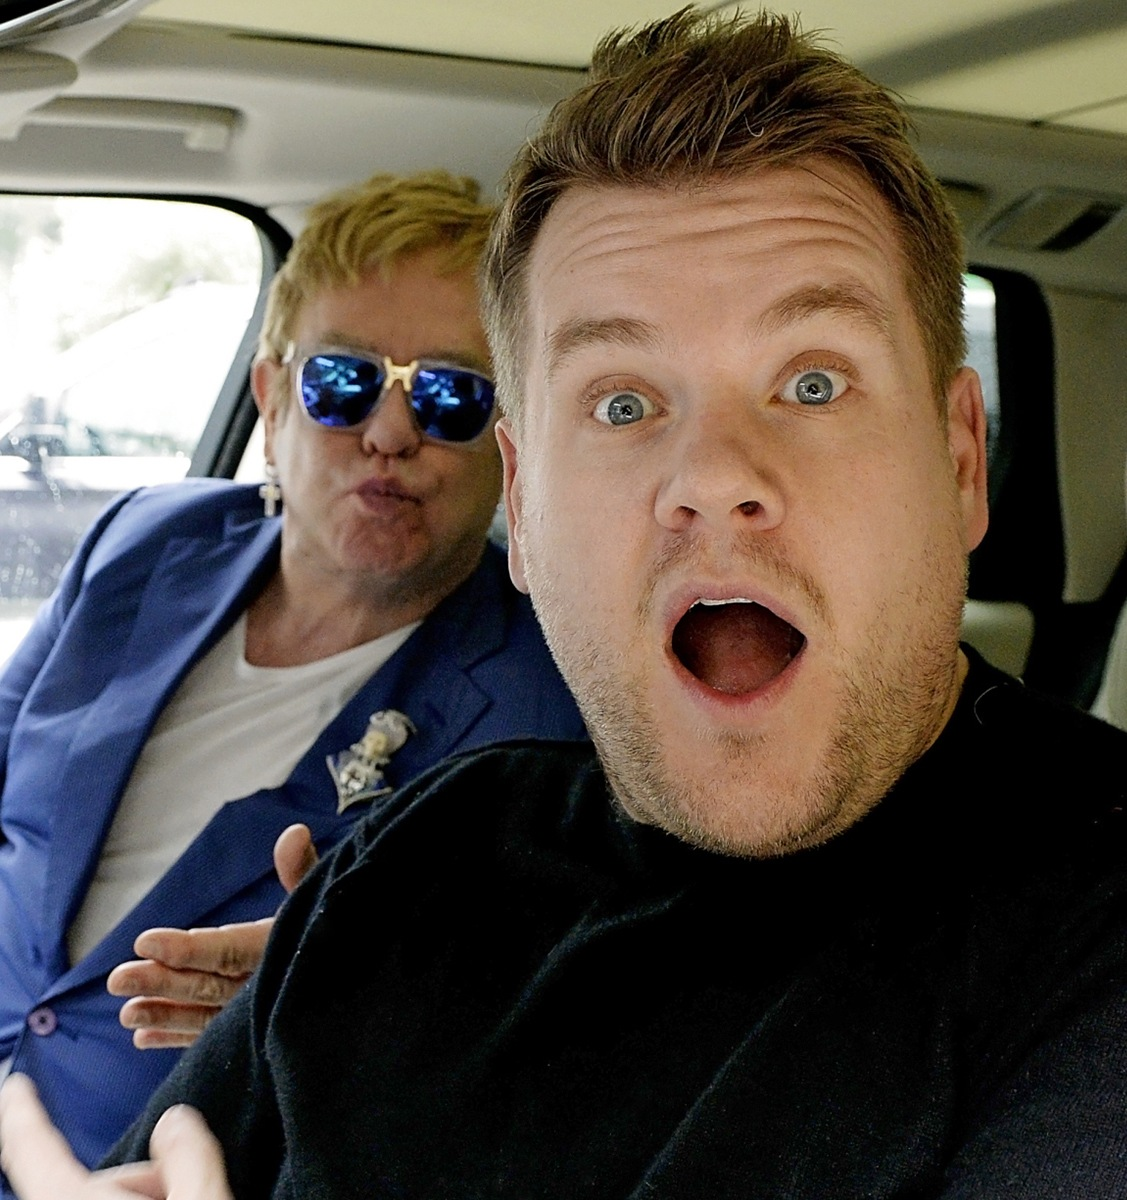 james corden carpool karaoke today main 180810 19bd51e06b74aa97d244f7cc64920049 25 Things You Didn't Know About James Corden